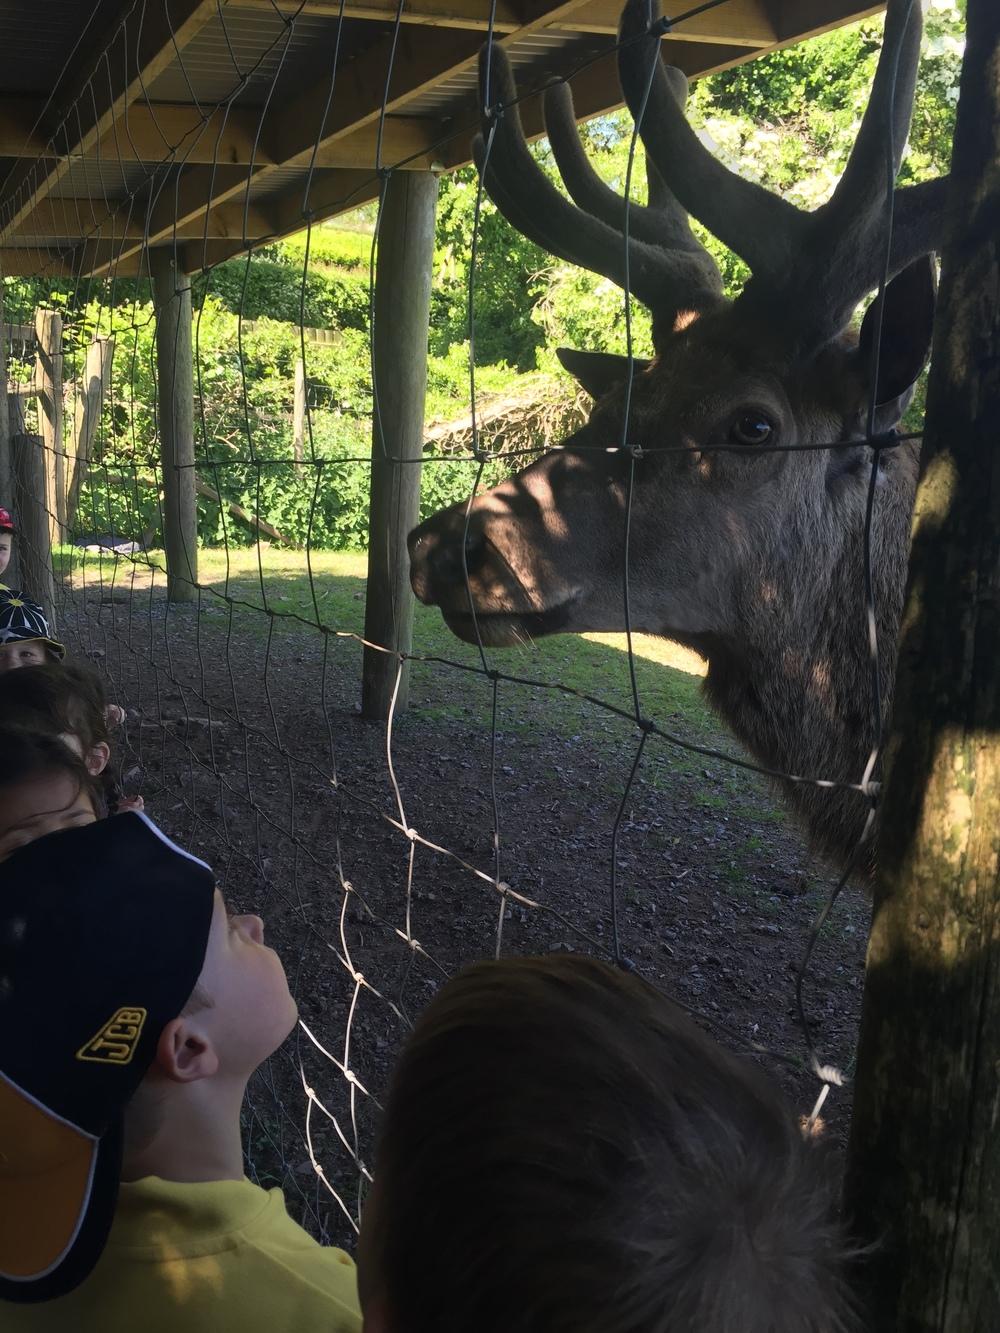 Saying hello to the deer